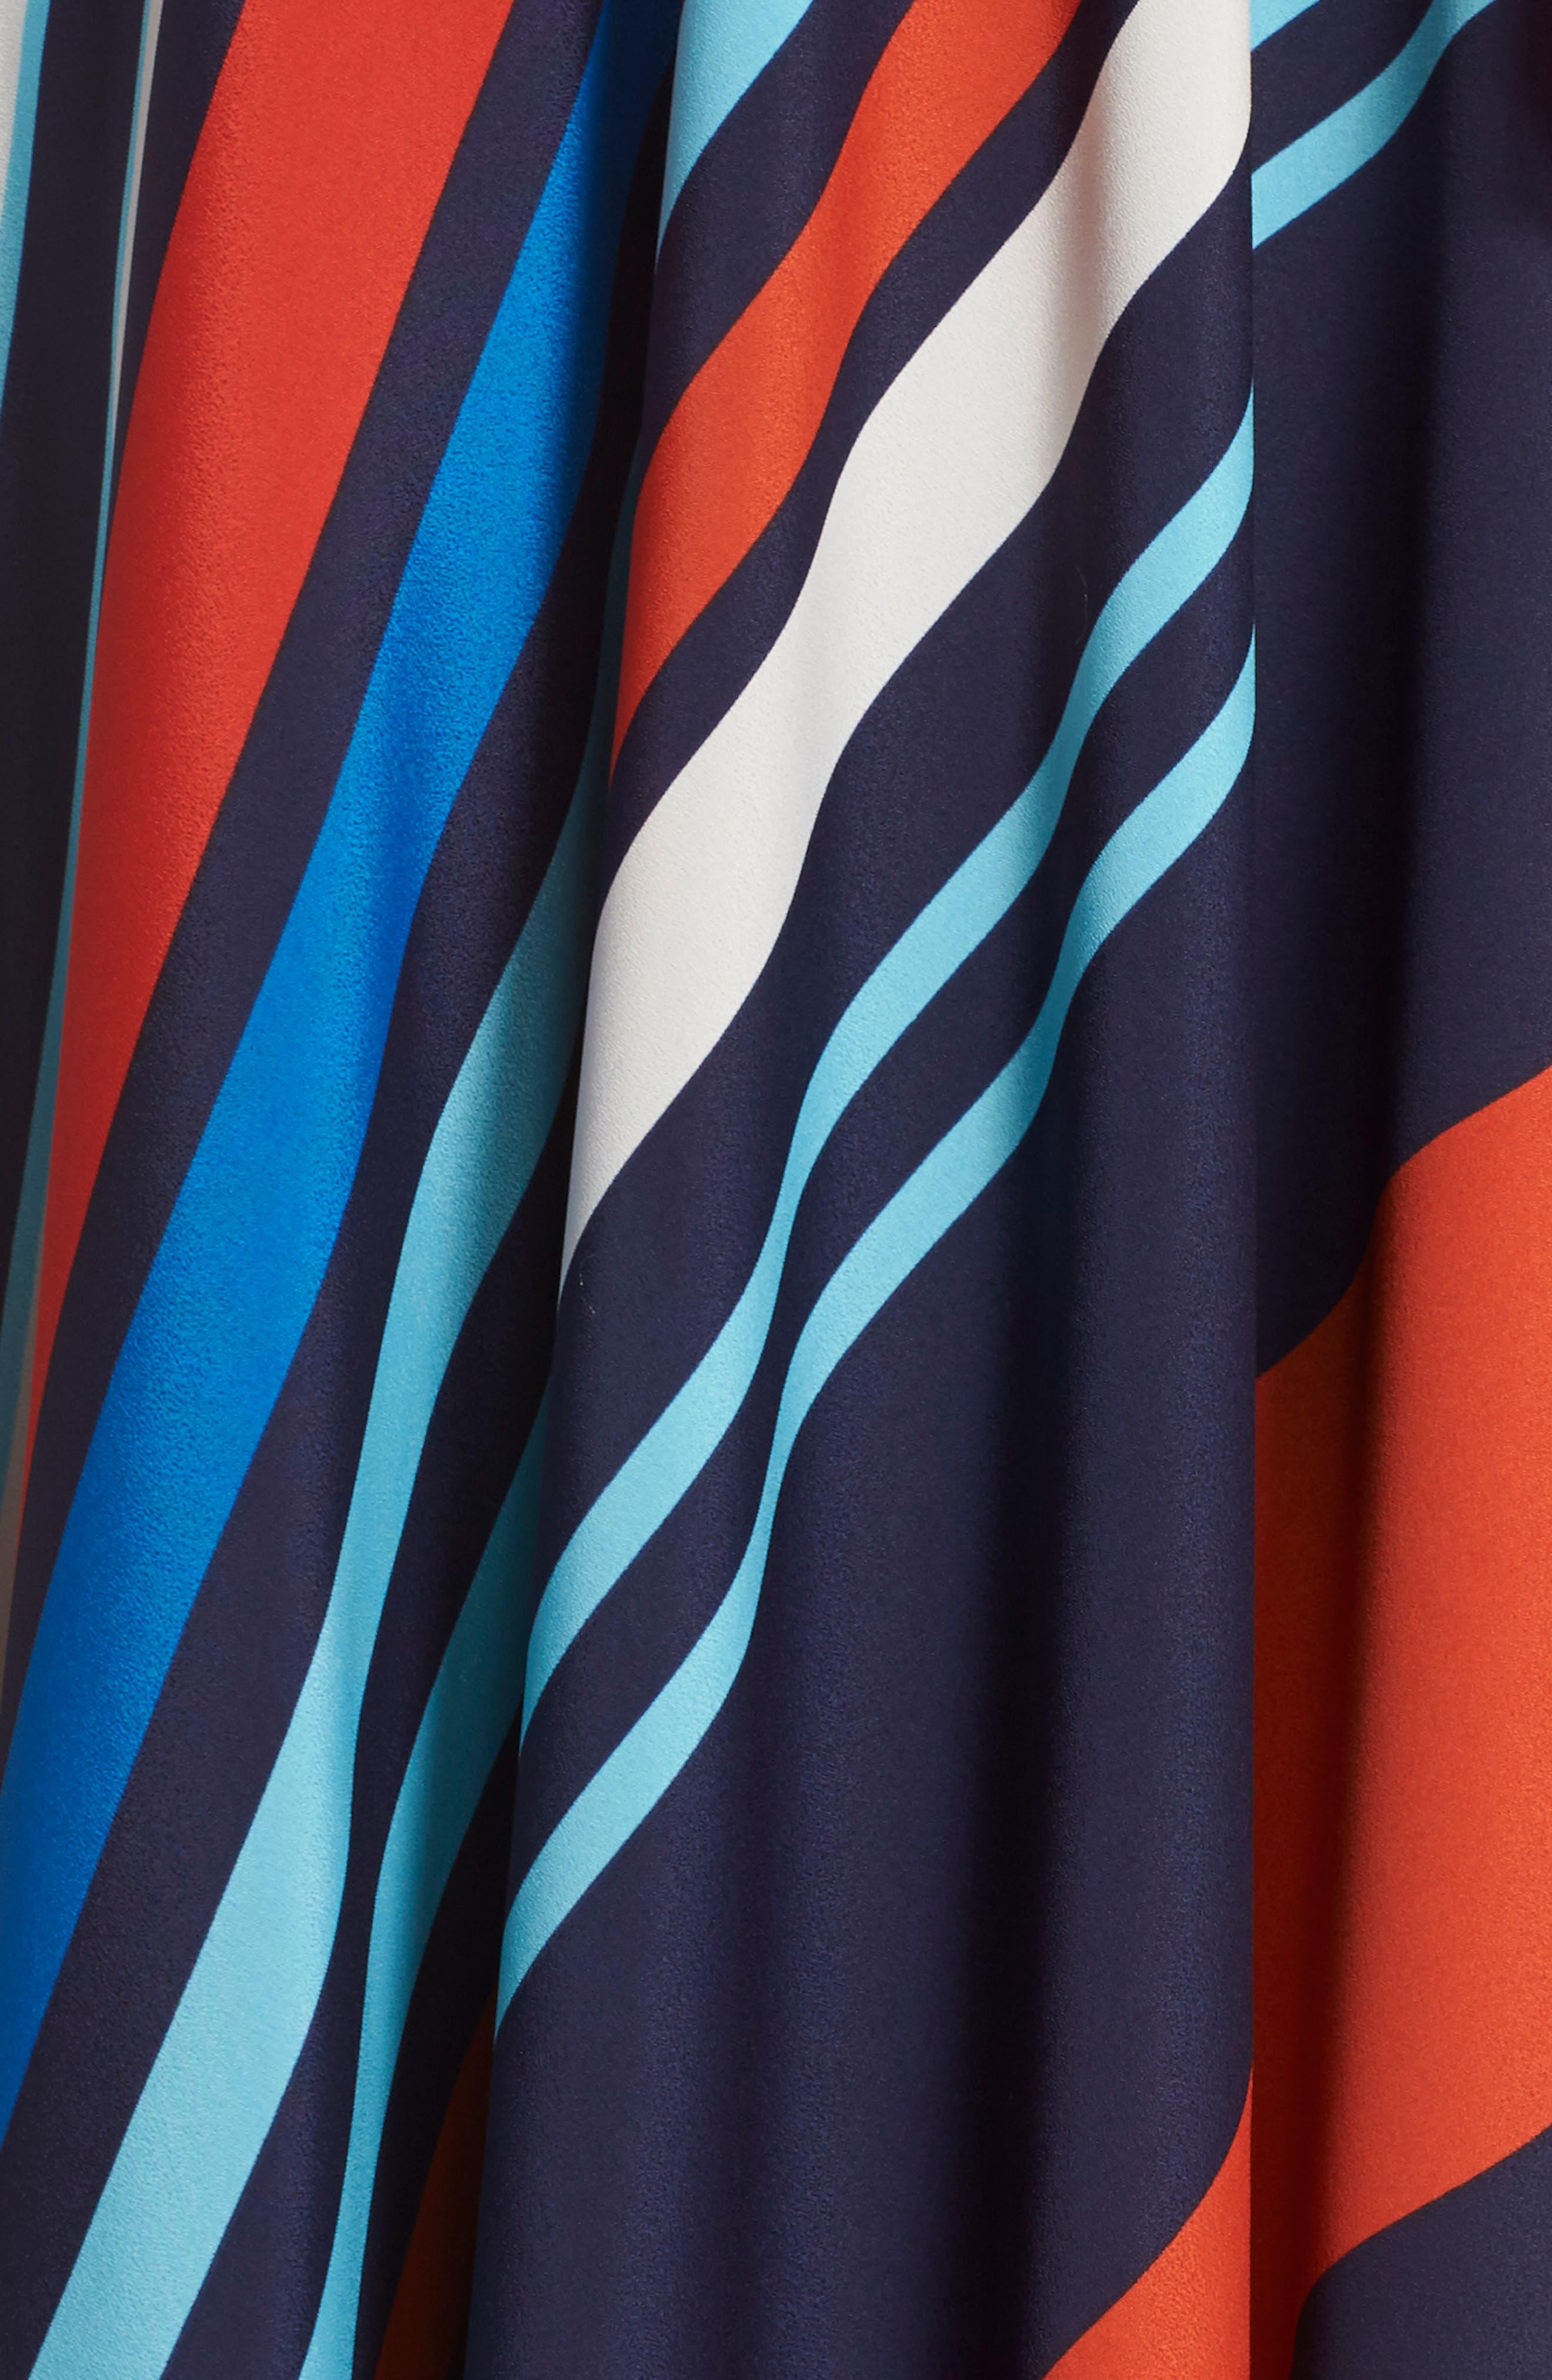 Jersey & Stripe Maxi Dress,                             Alternate thumbnail 6, color,